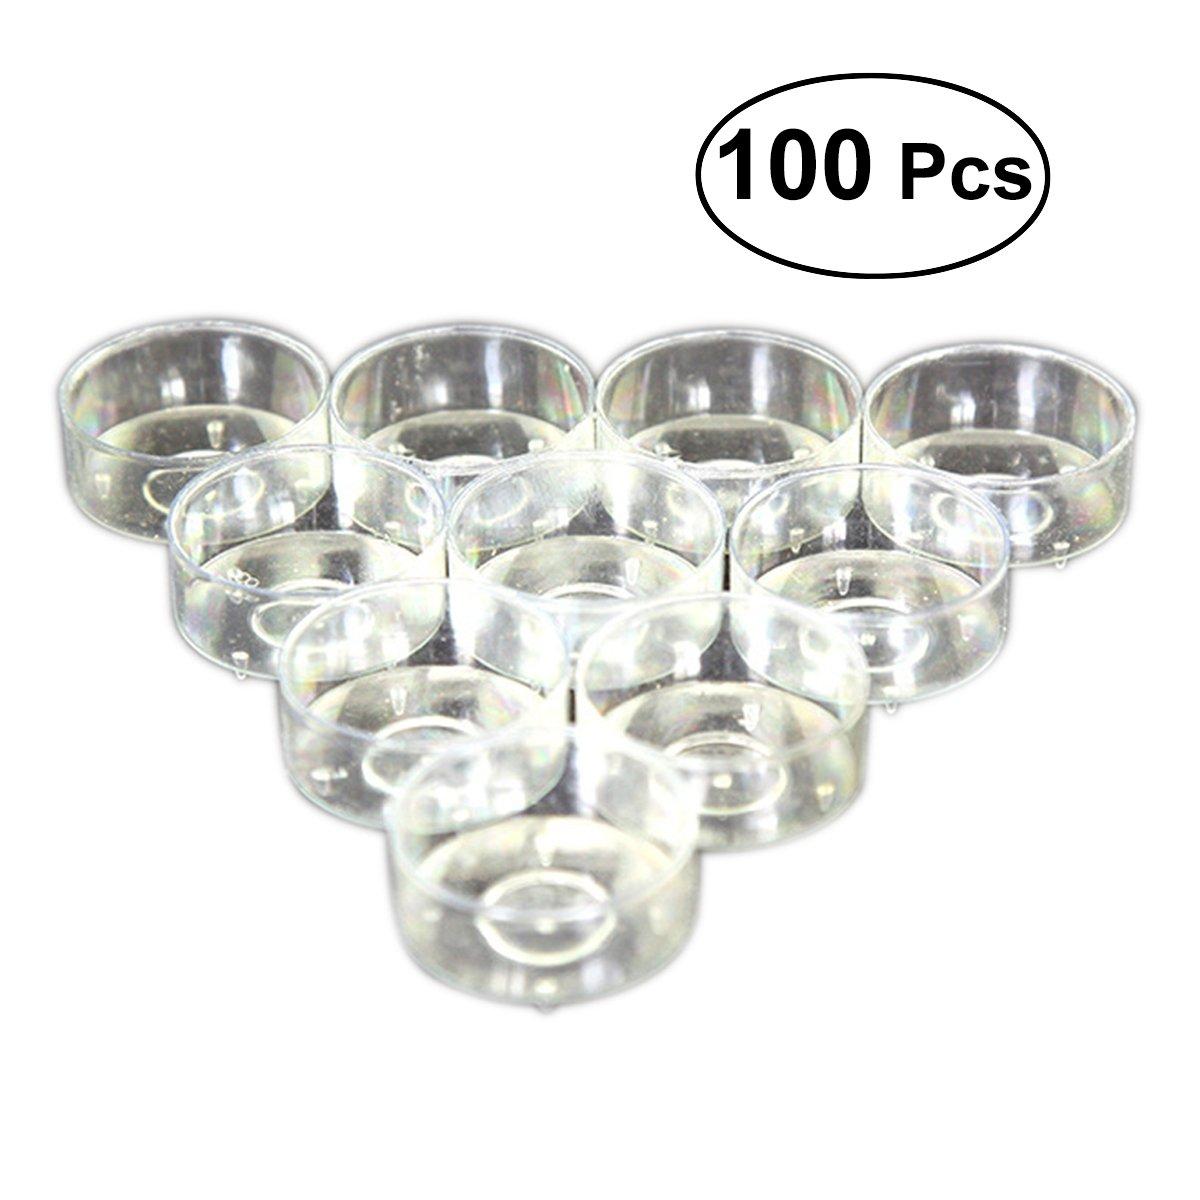 ROSENICE Portacandele in plastica Candela trasparente Per le forniture di tempio 100 pezzi